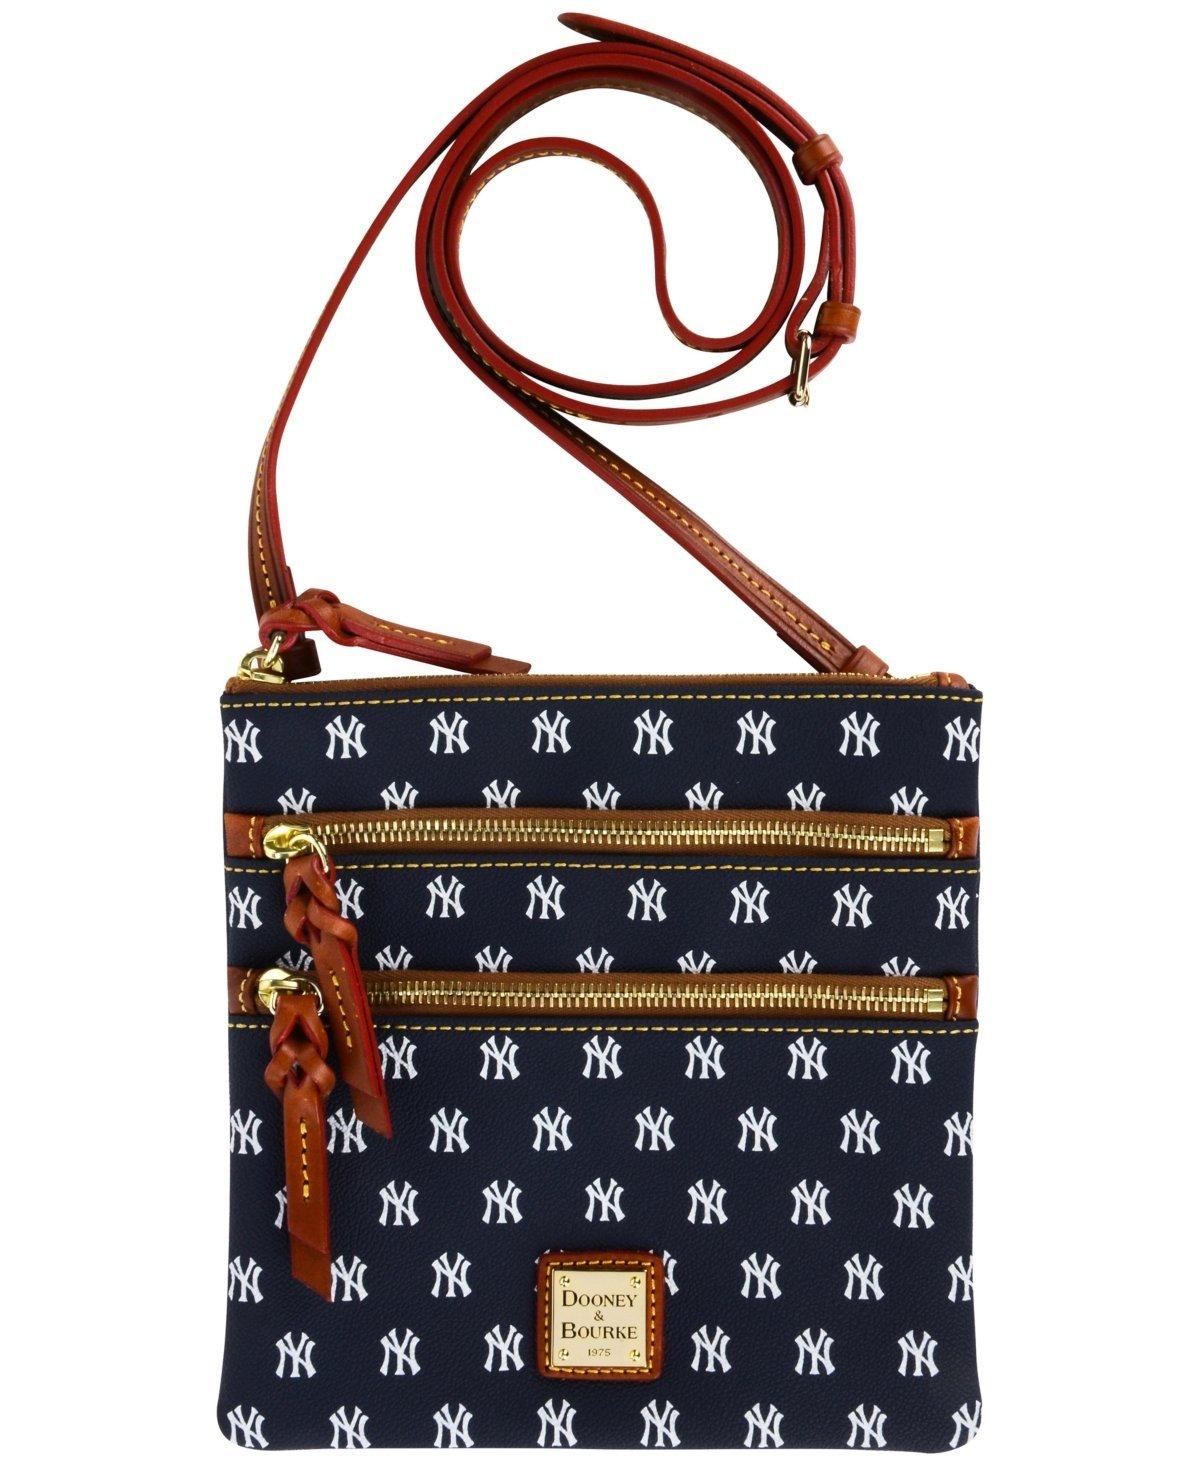 e6eff6ccfa02 Get Quotations · Dooney Bourke MLB Triple Zip Crossbody New York Yankees  Cross Body Handbags